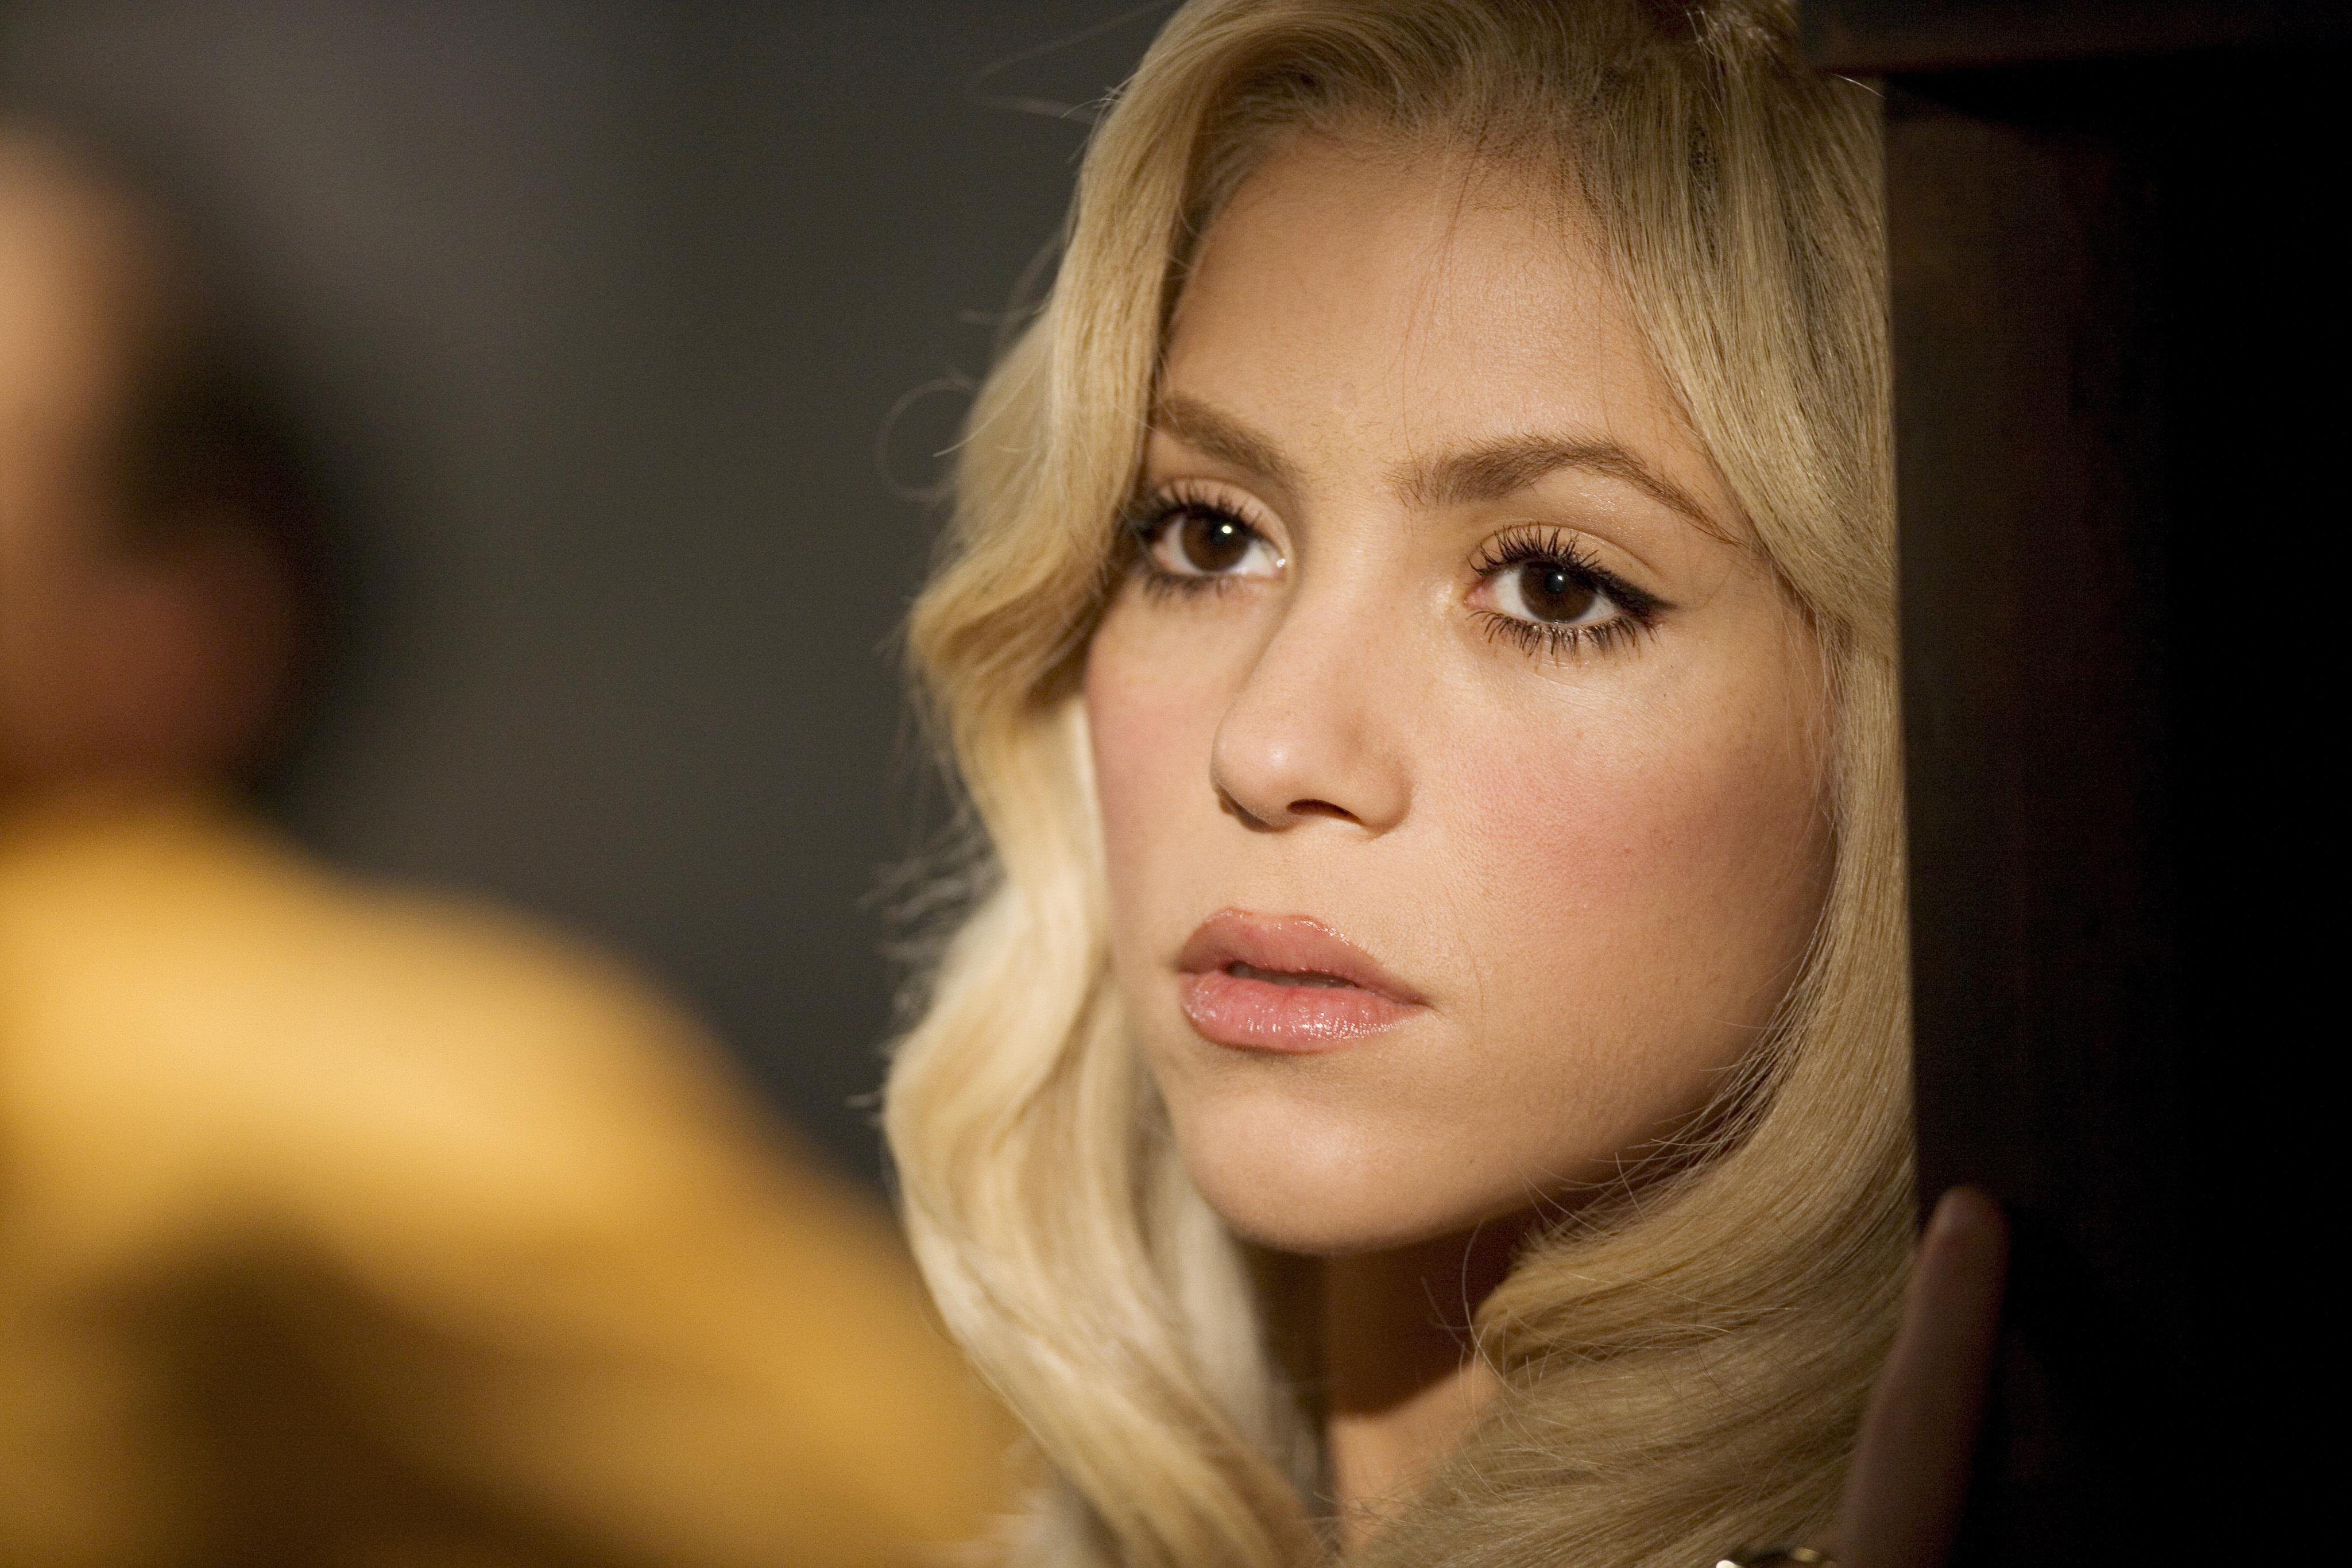 Shakira singer music blonde celebrity shakira wallpapers photos 4096x2731